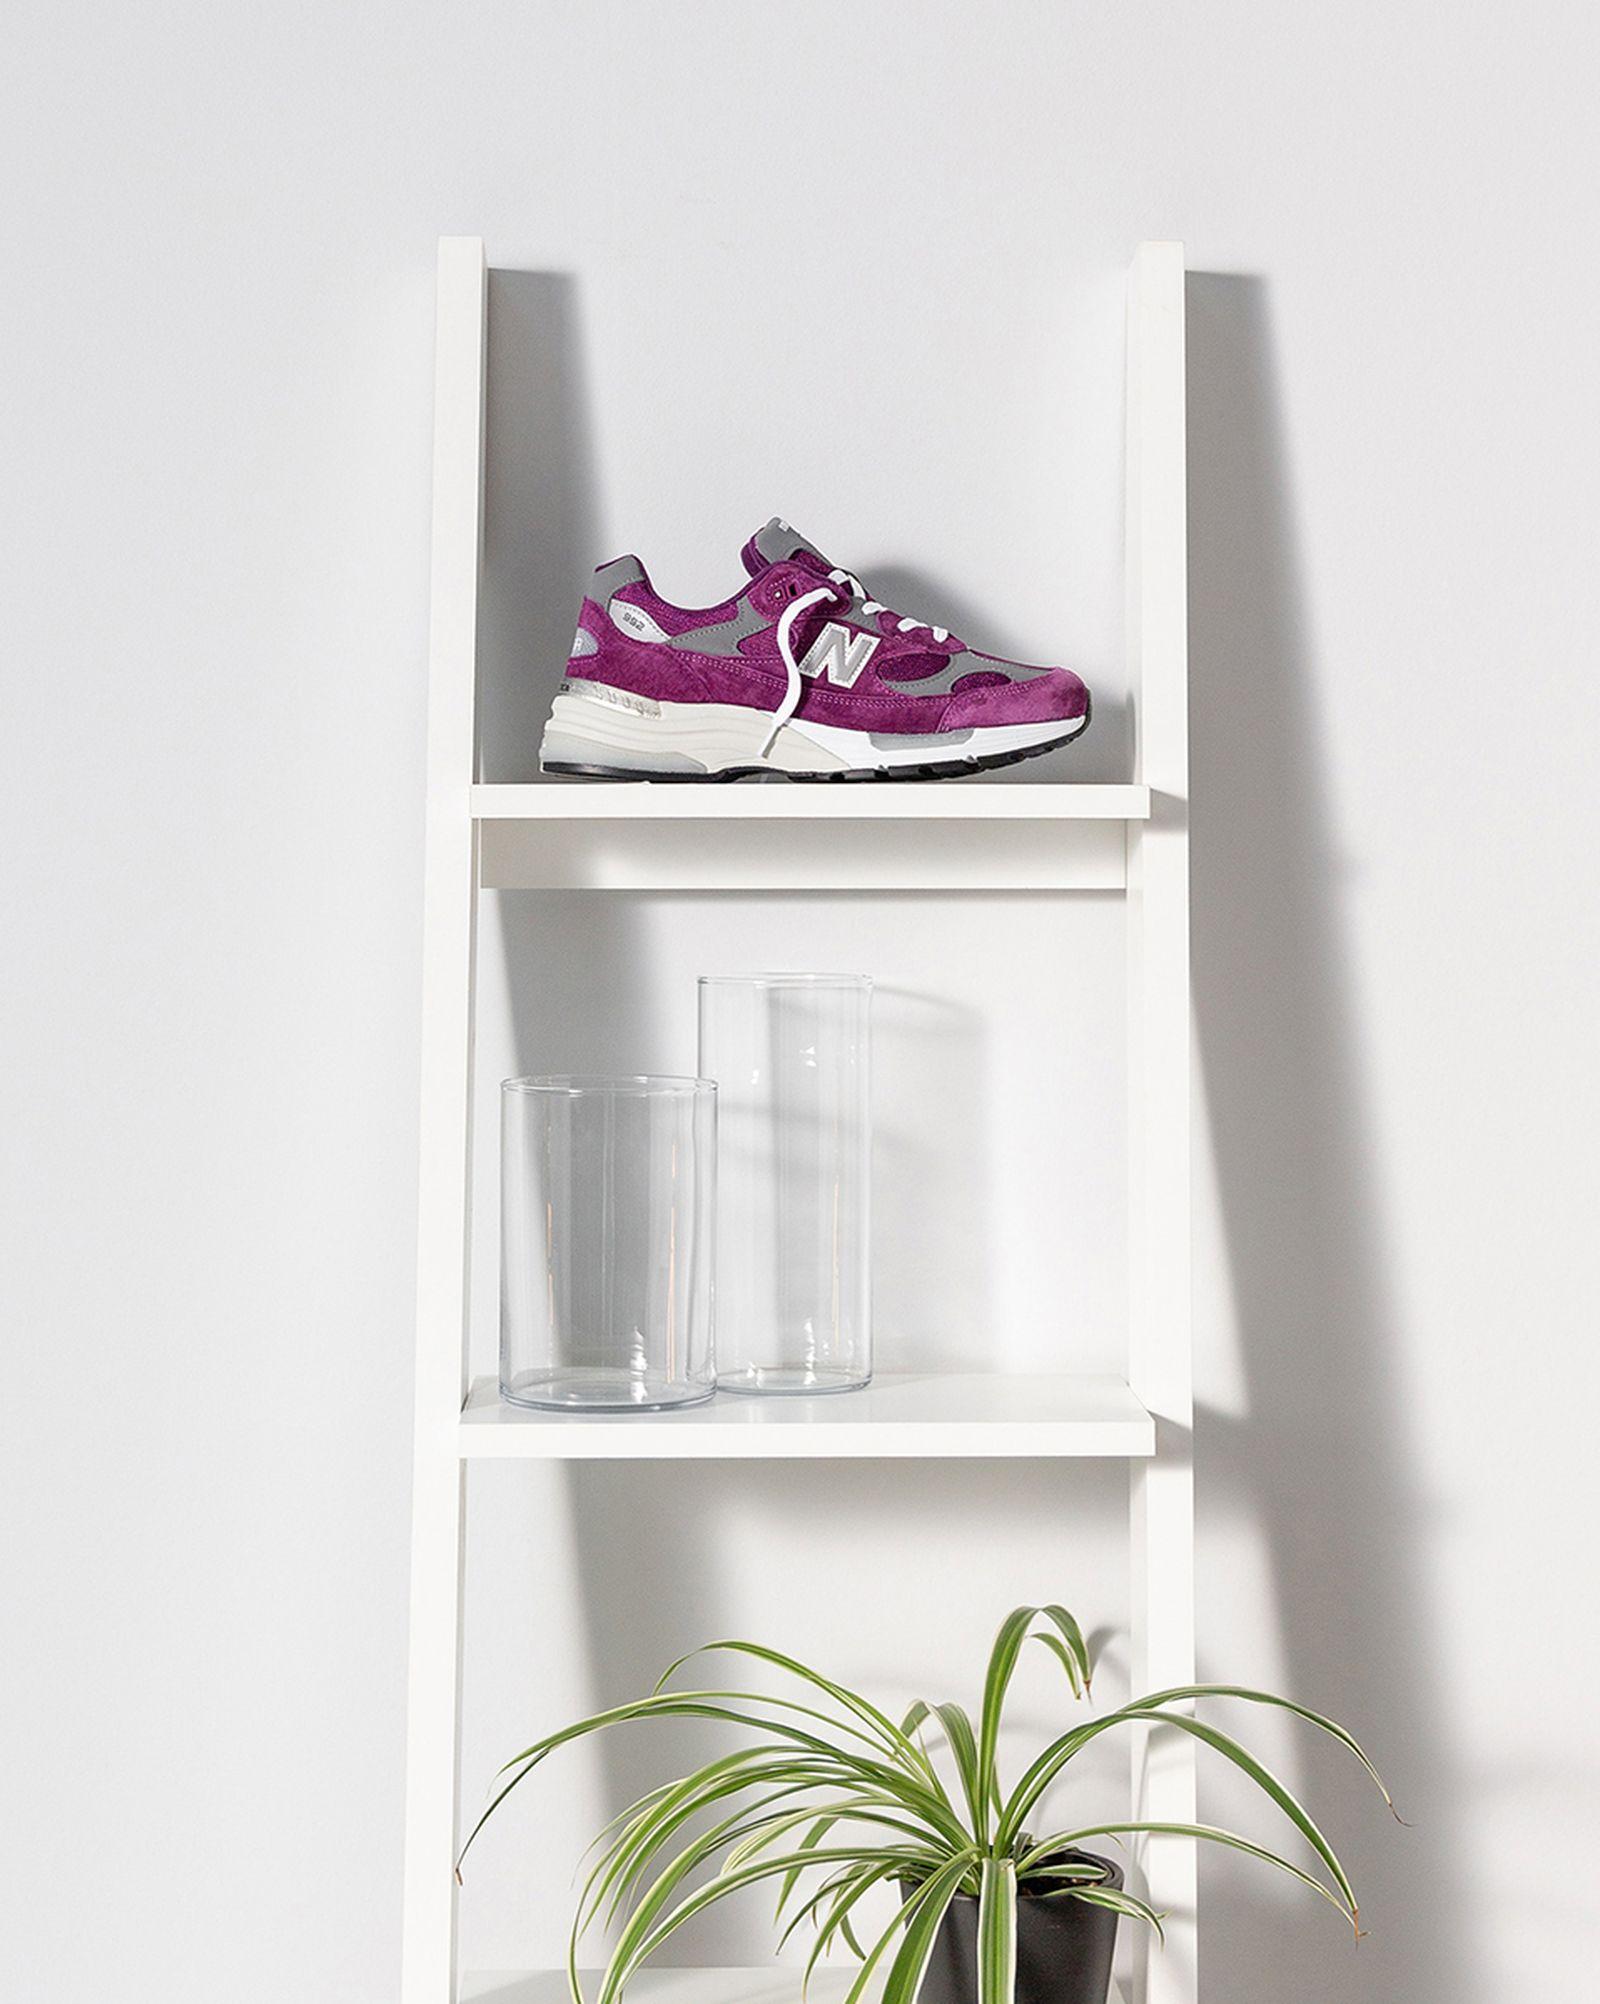 new-balance-992-purple-grey-release-date-price-06